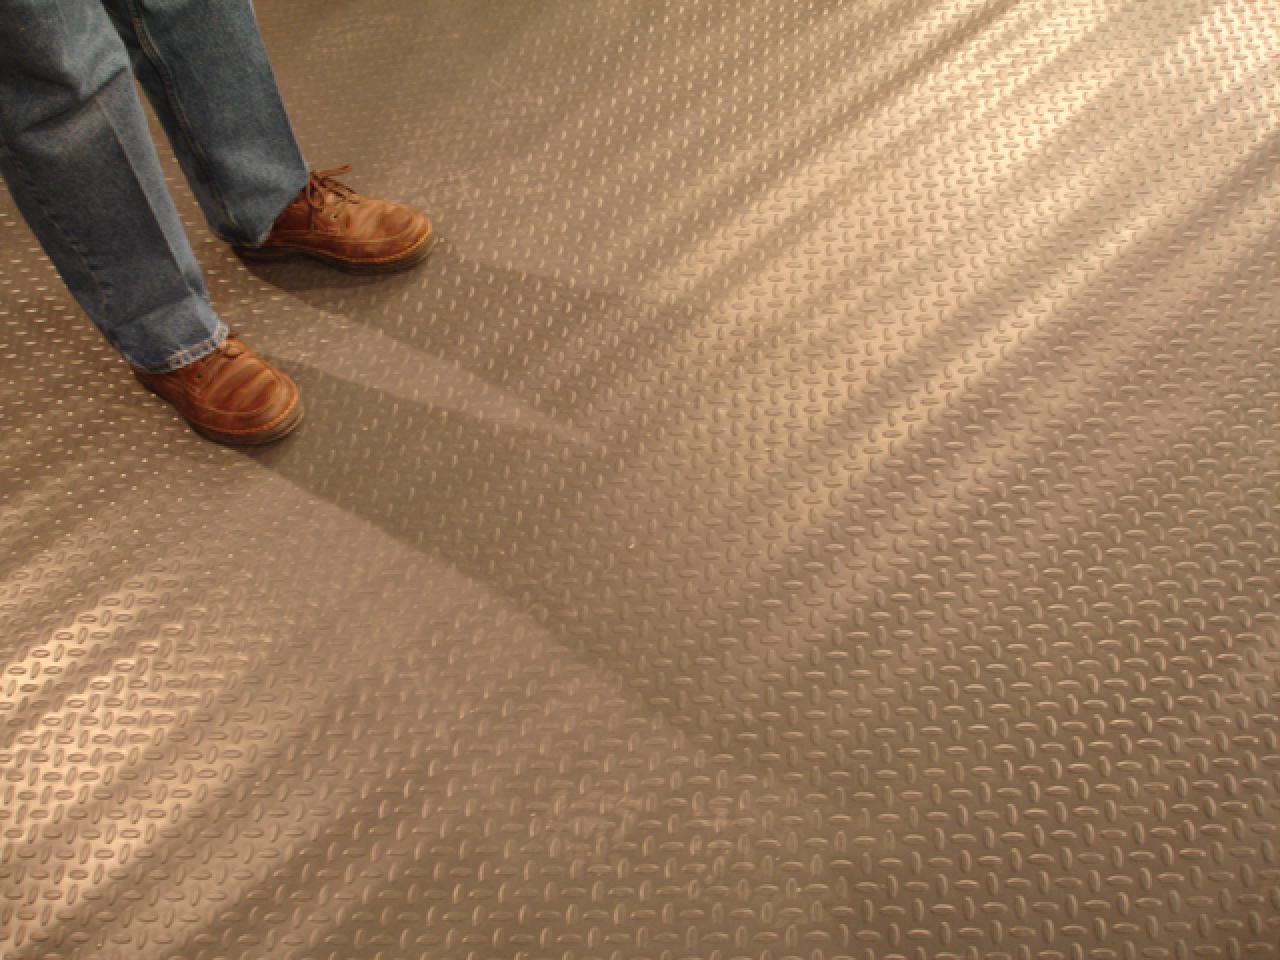 Workshop Flooring Options Workshop Design Ideas, Organization ... - ^